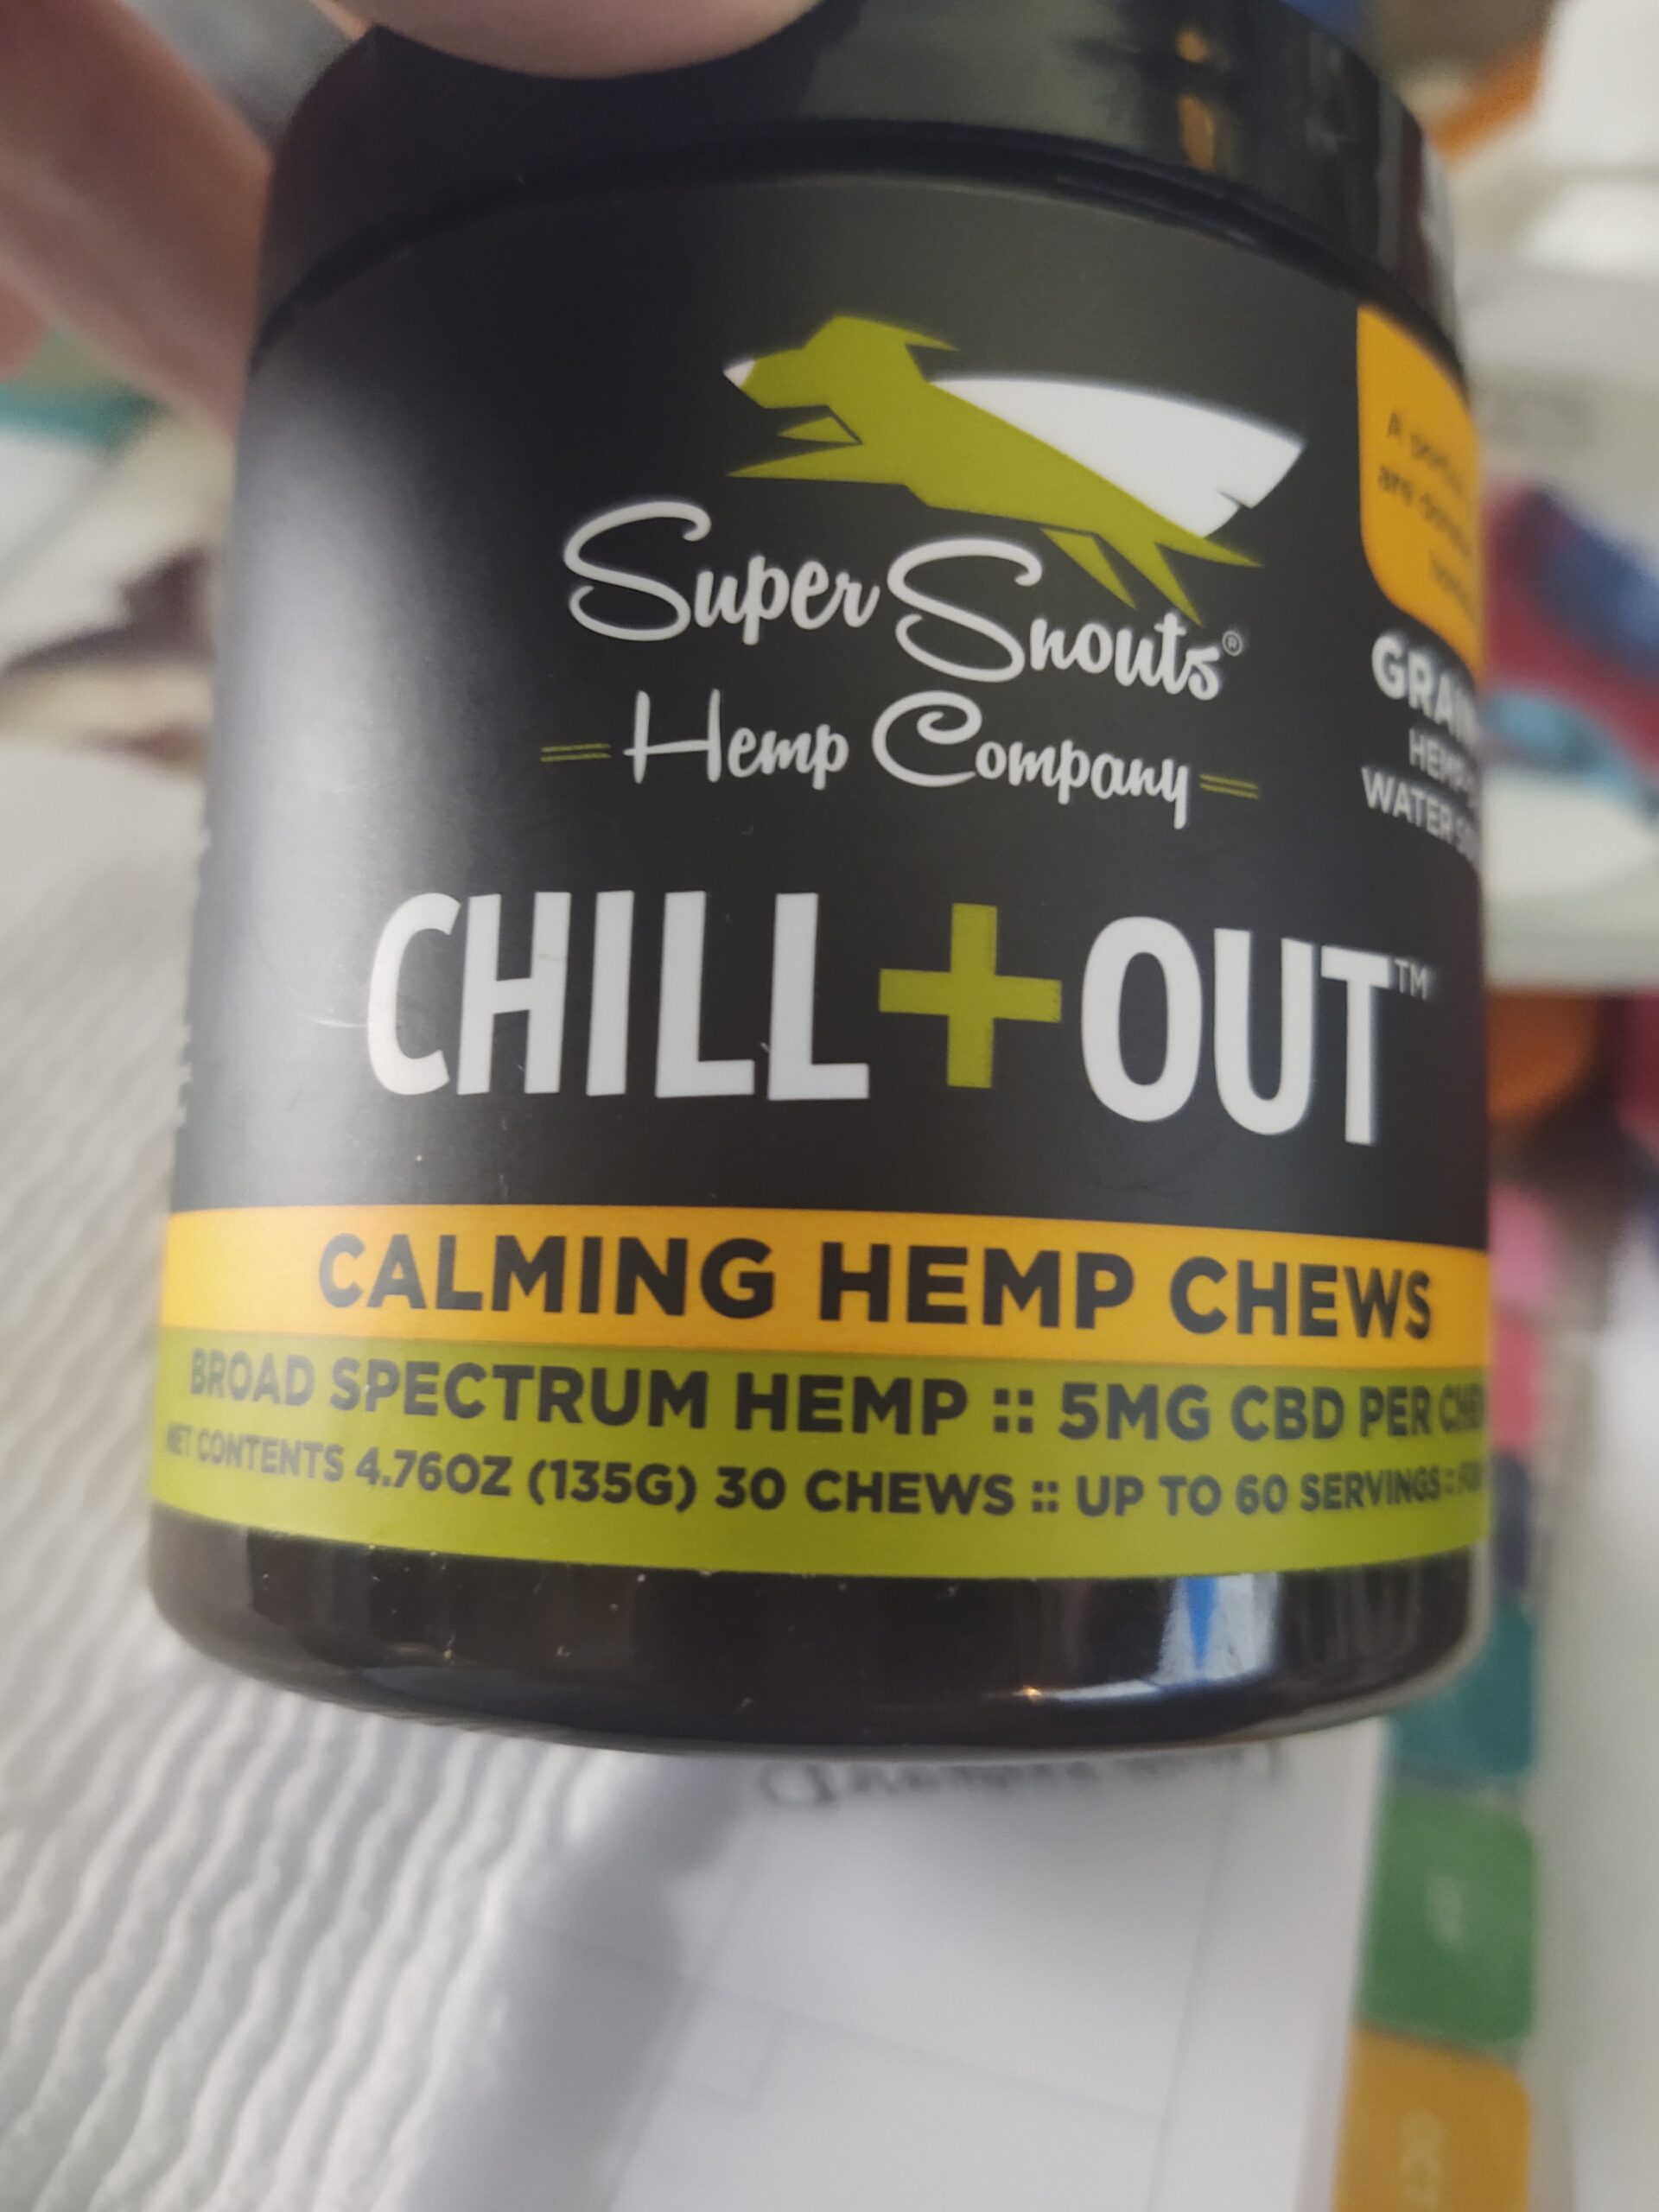 Super Snouts Chill Out Hemp Chews